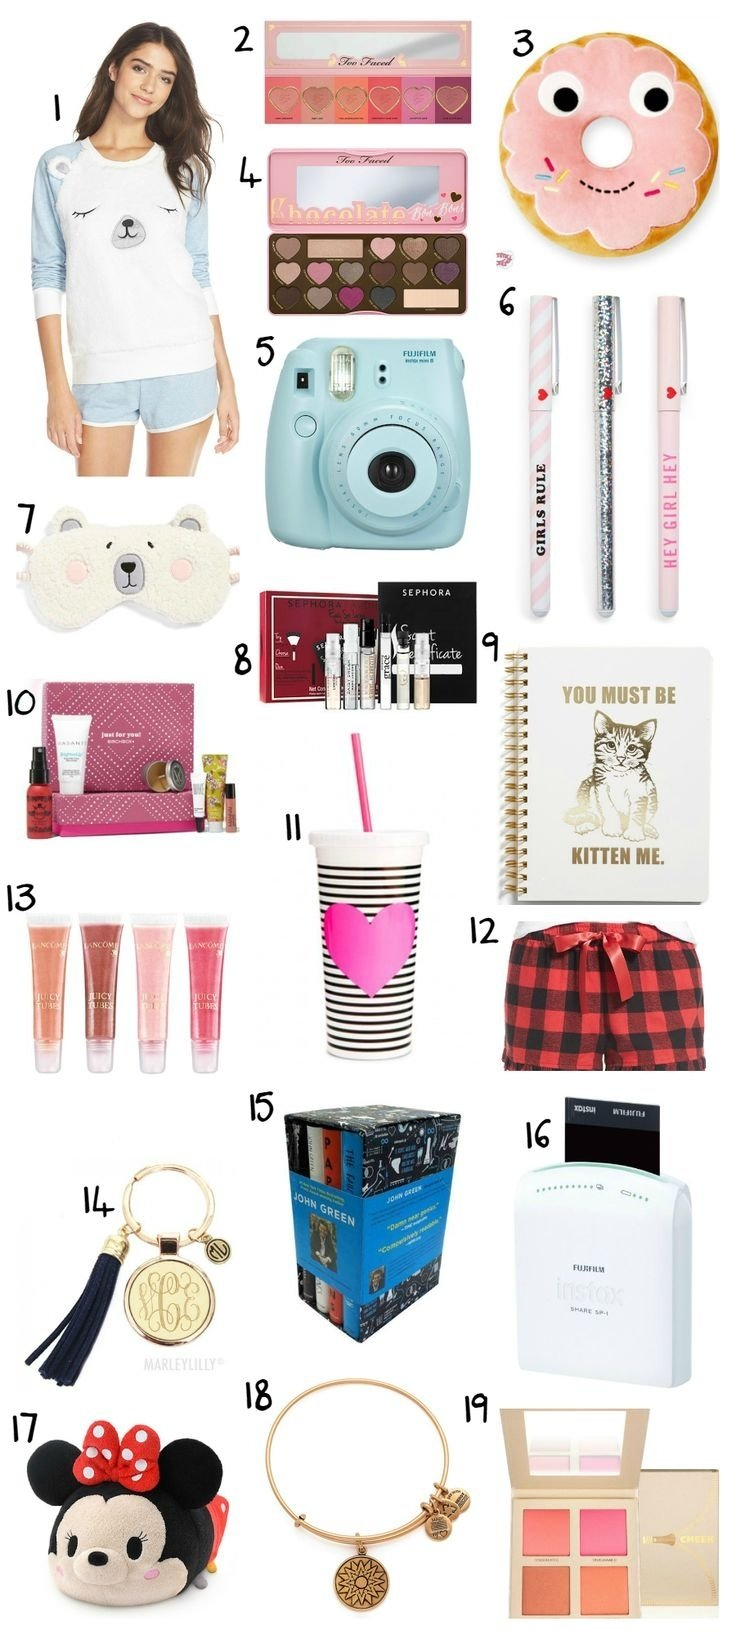 10 Stylish Good Ideas For Christmas Presents download good christmas gifts for teenage girl littlebubble 1